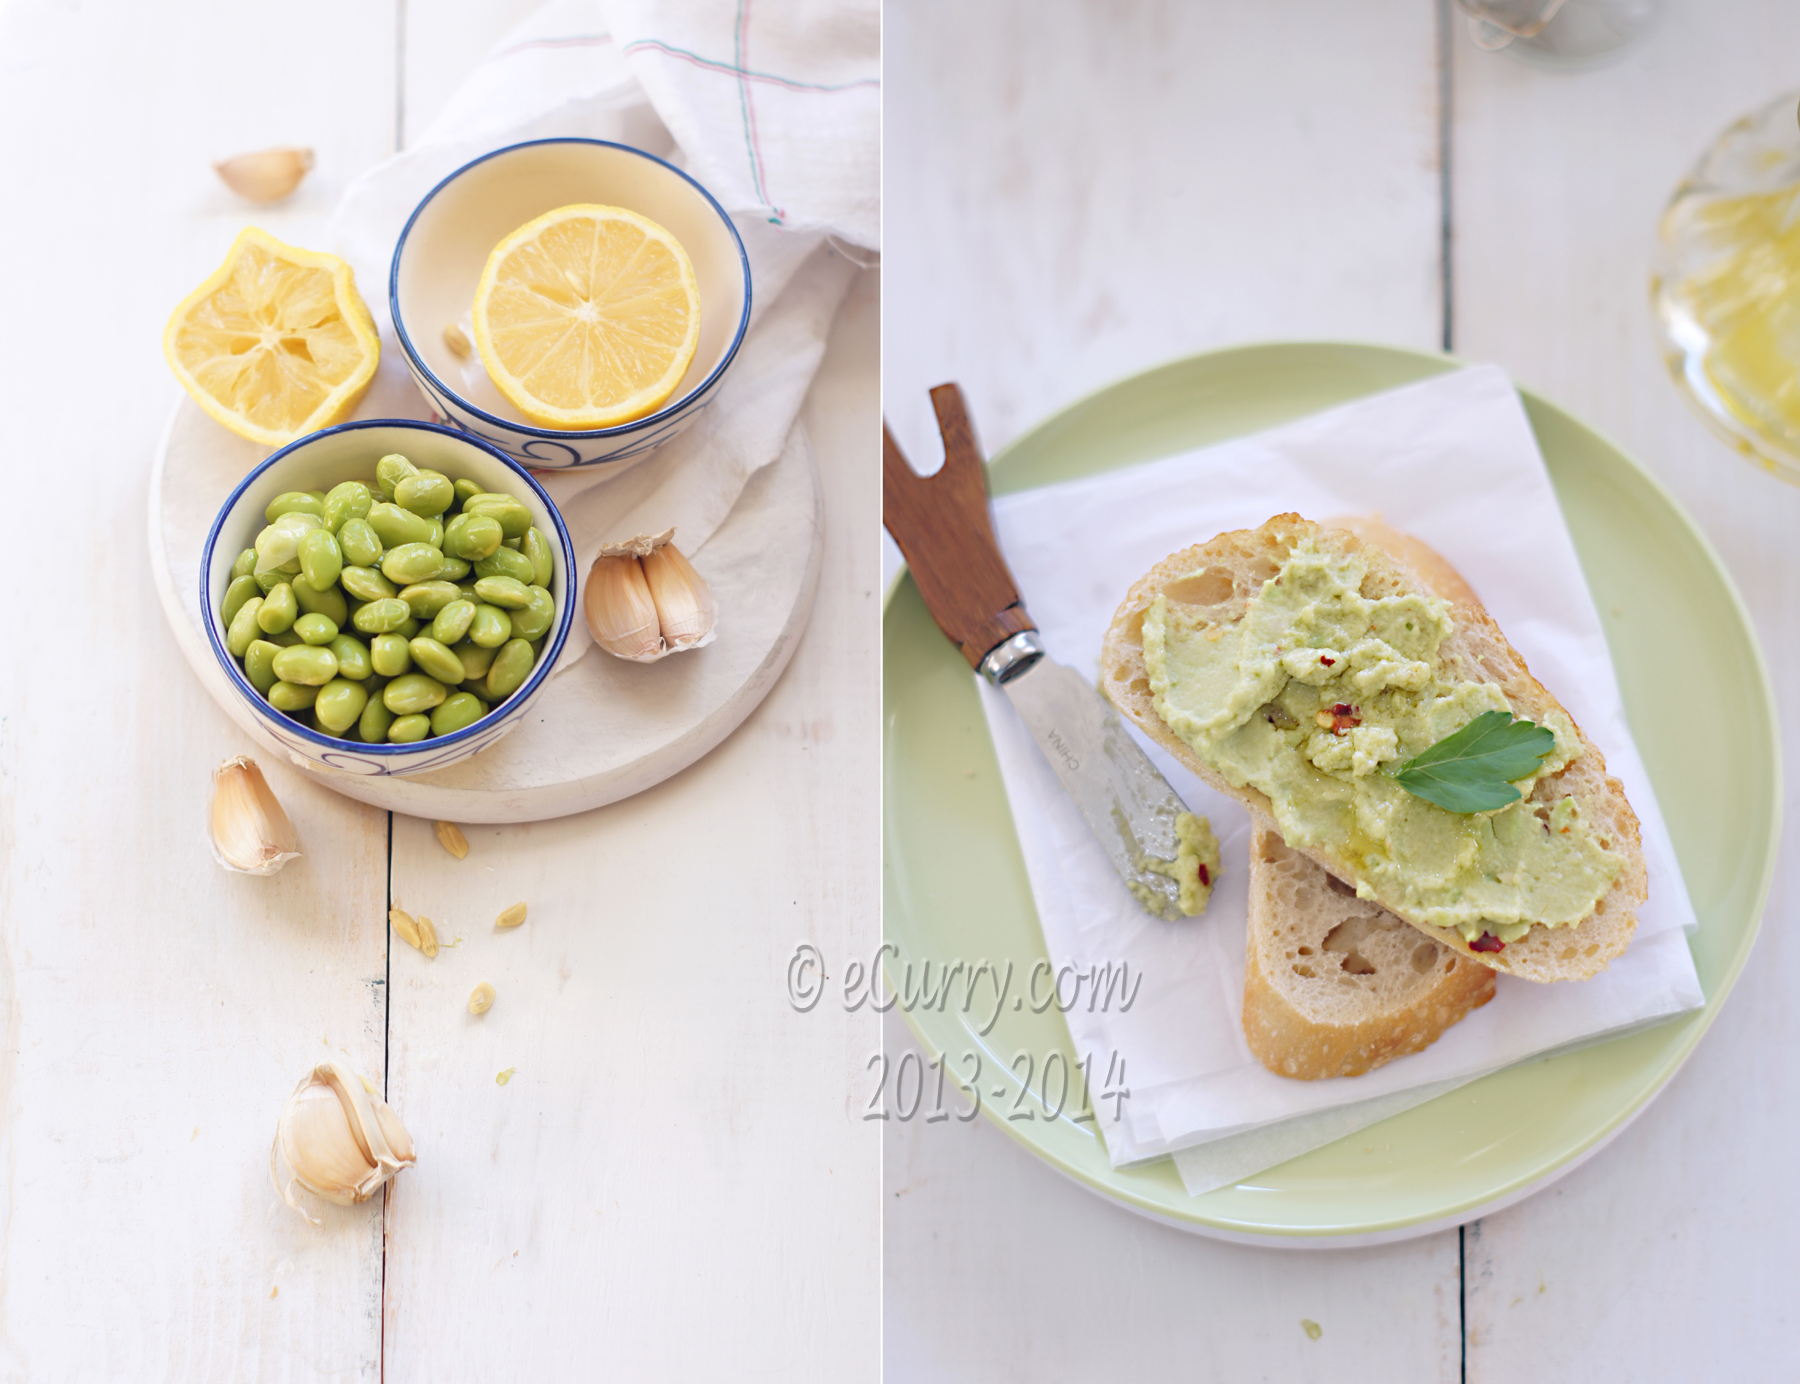 edamame-and-garlic-spread-diptych-1.jpg